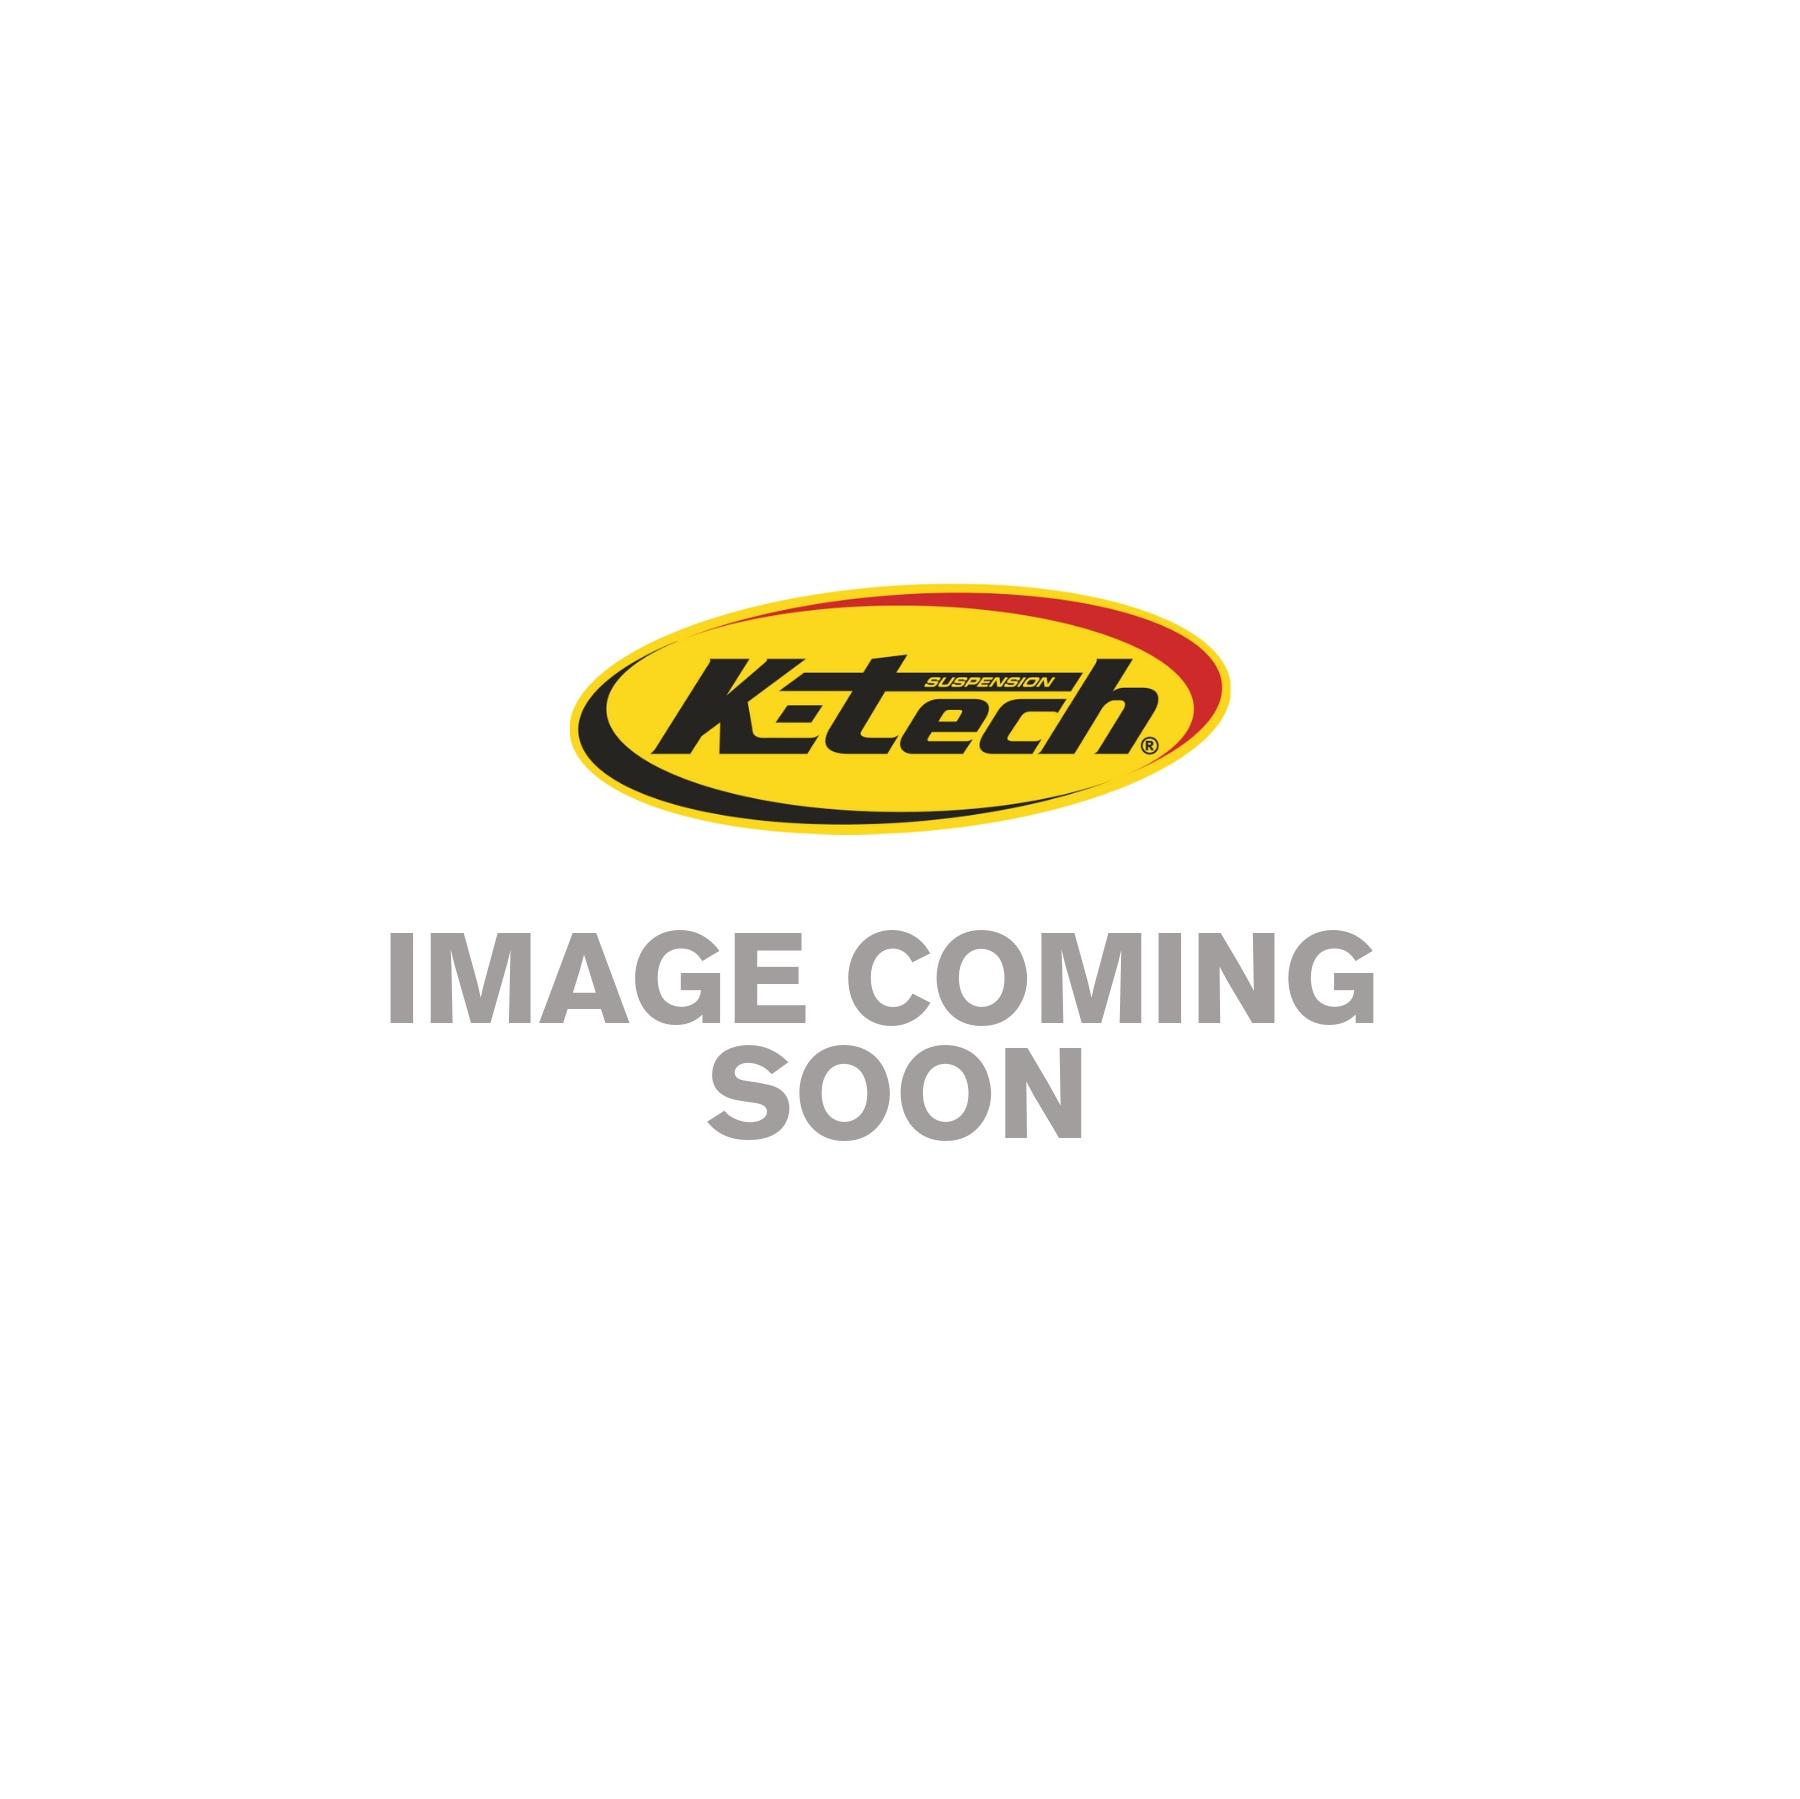 Shock Absorber Spring Jack Insert -(75.0x61.0) K-Tech Razor / Lite